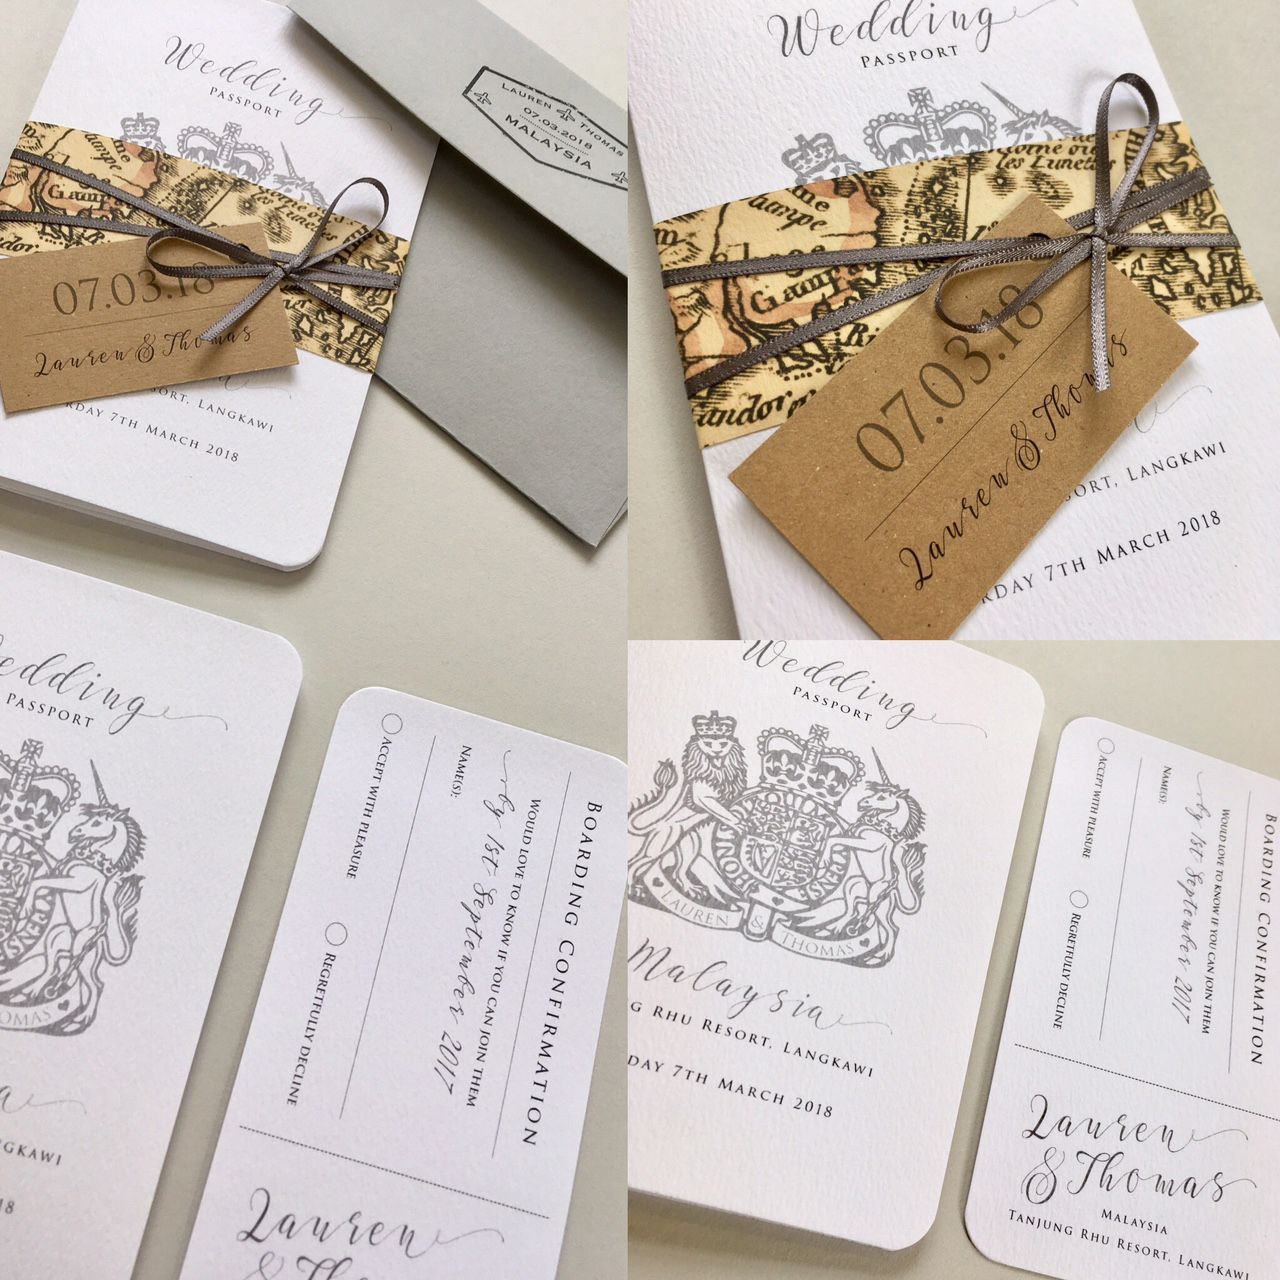 Passport Wedding Invitation with boarding pass RSVP card